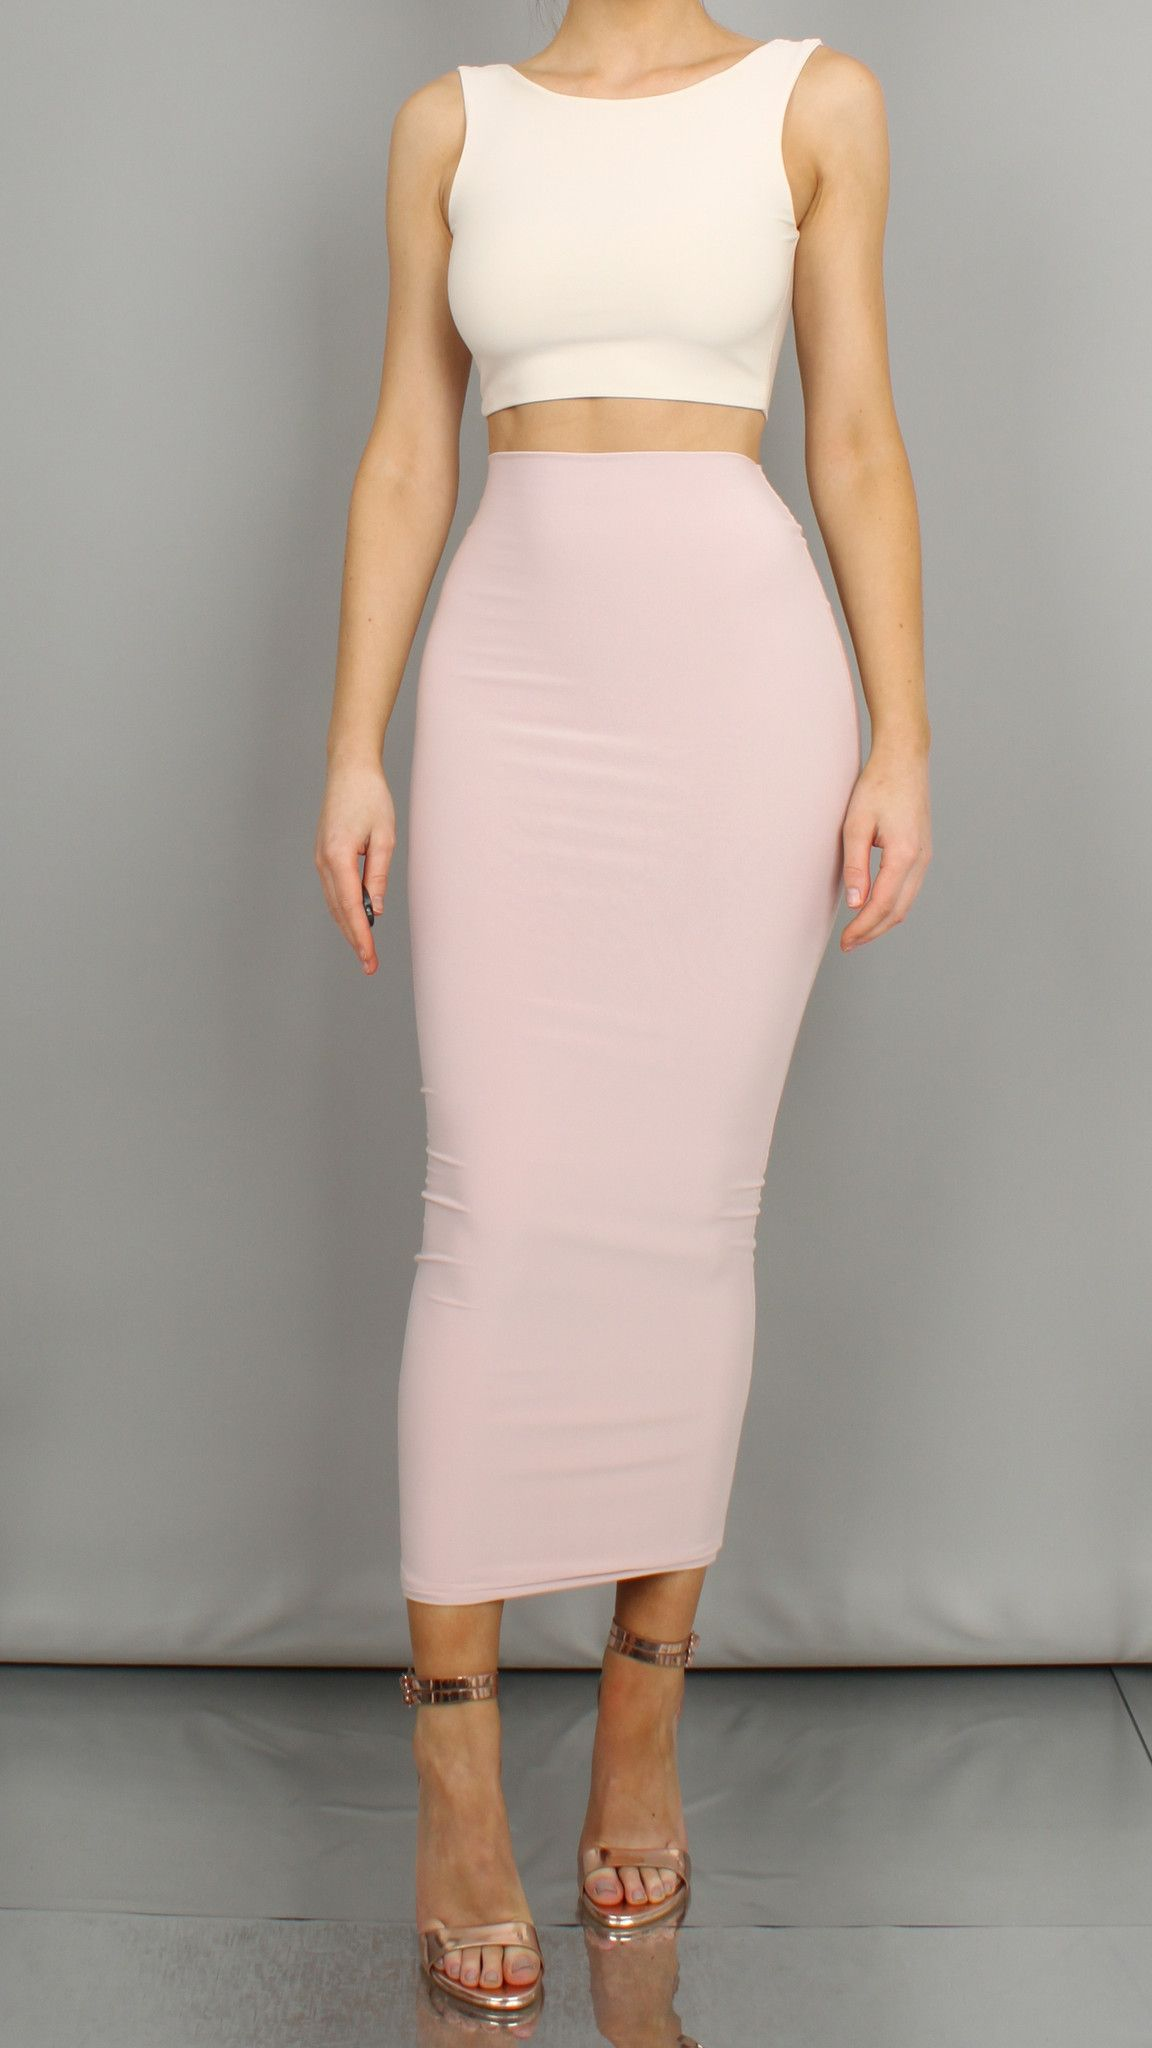 7c72714c9b Savannah Maxi Skirt Pink Skirt Outfits, Pencil Skirt Outfits, Work Outfits, Pencil  Skirts